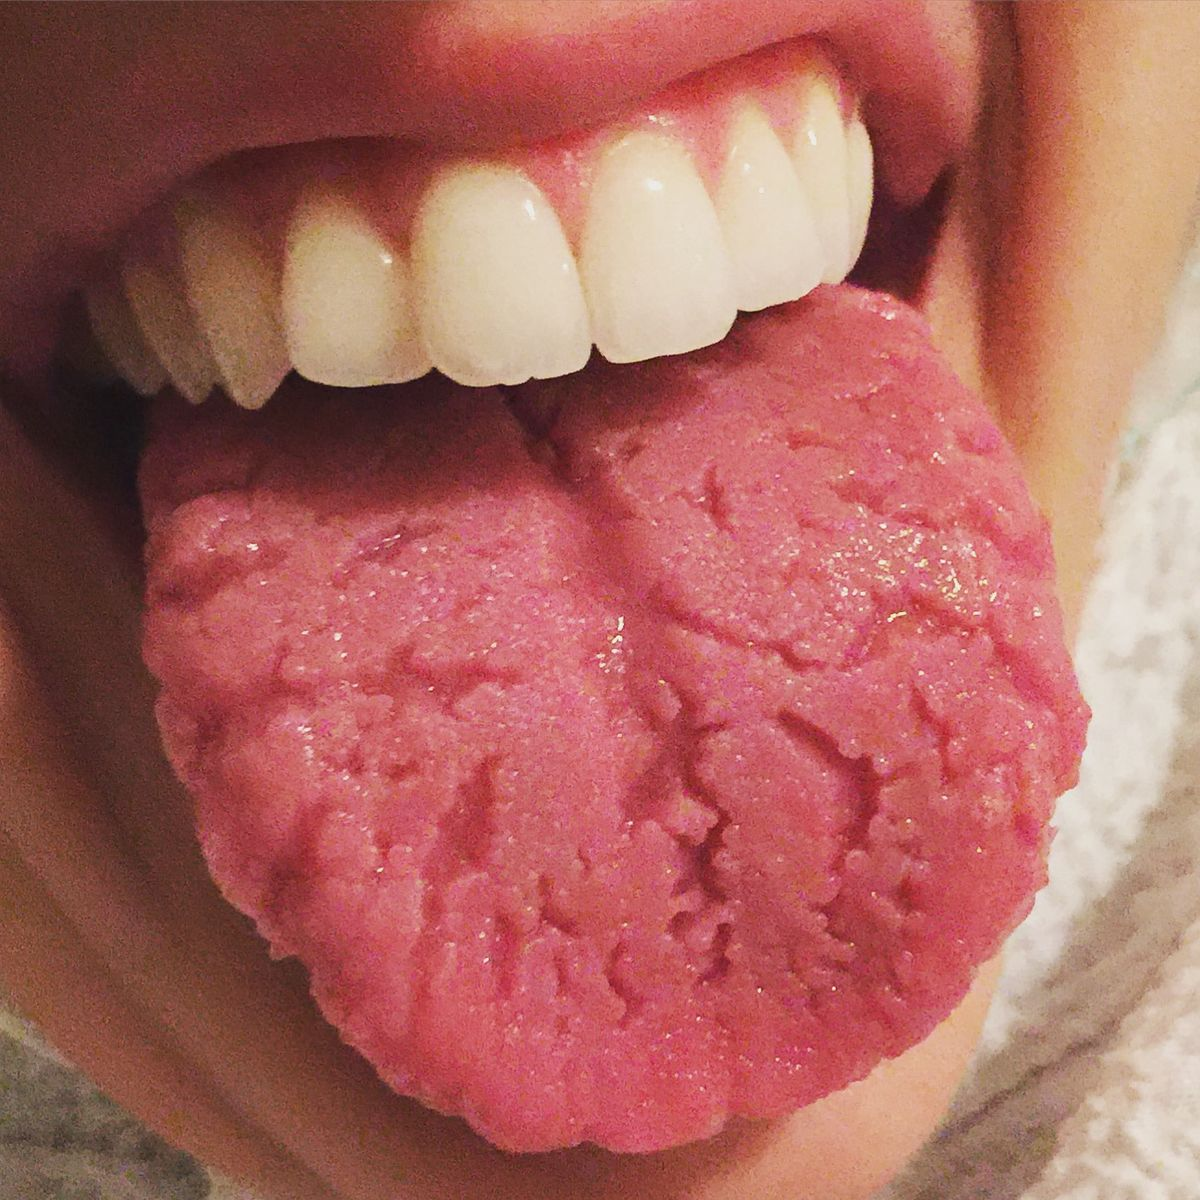 wart on my tongue